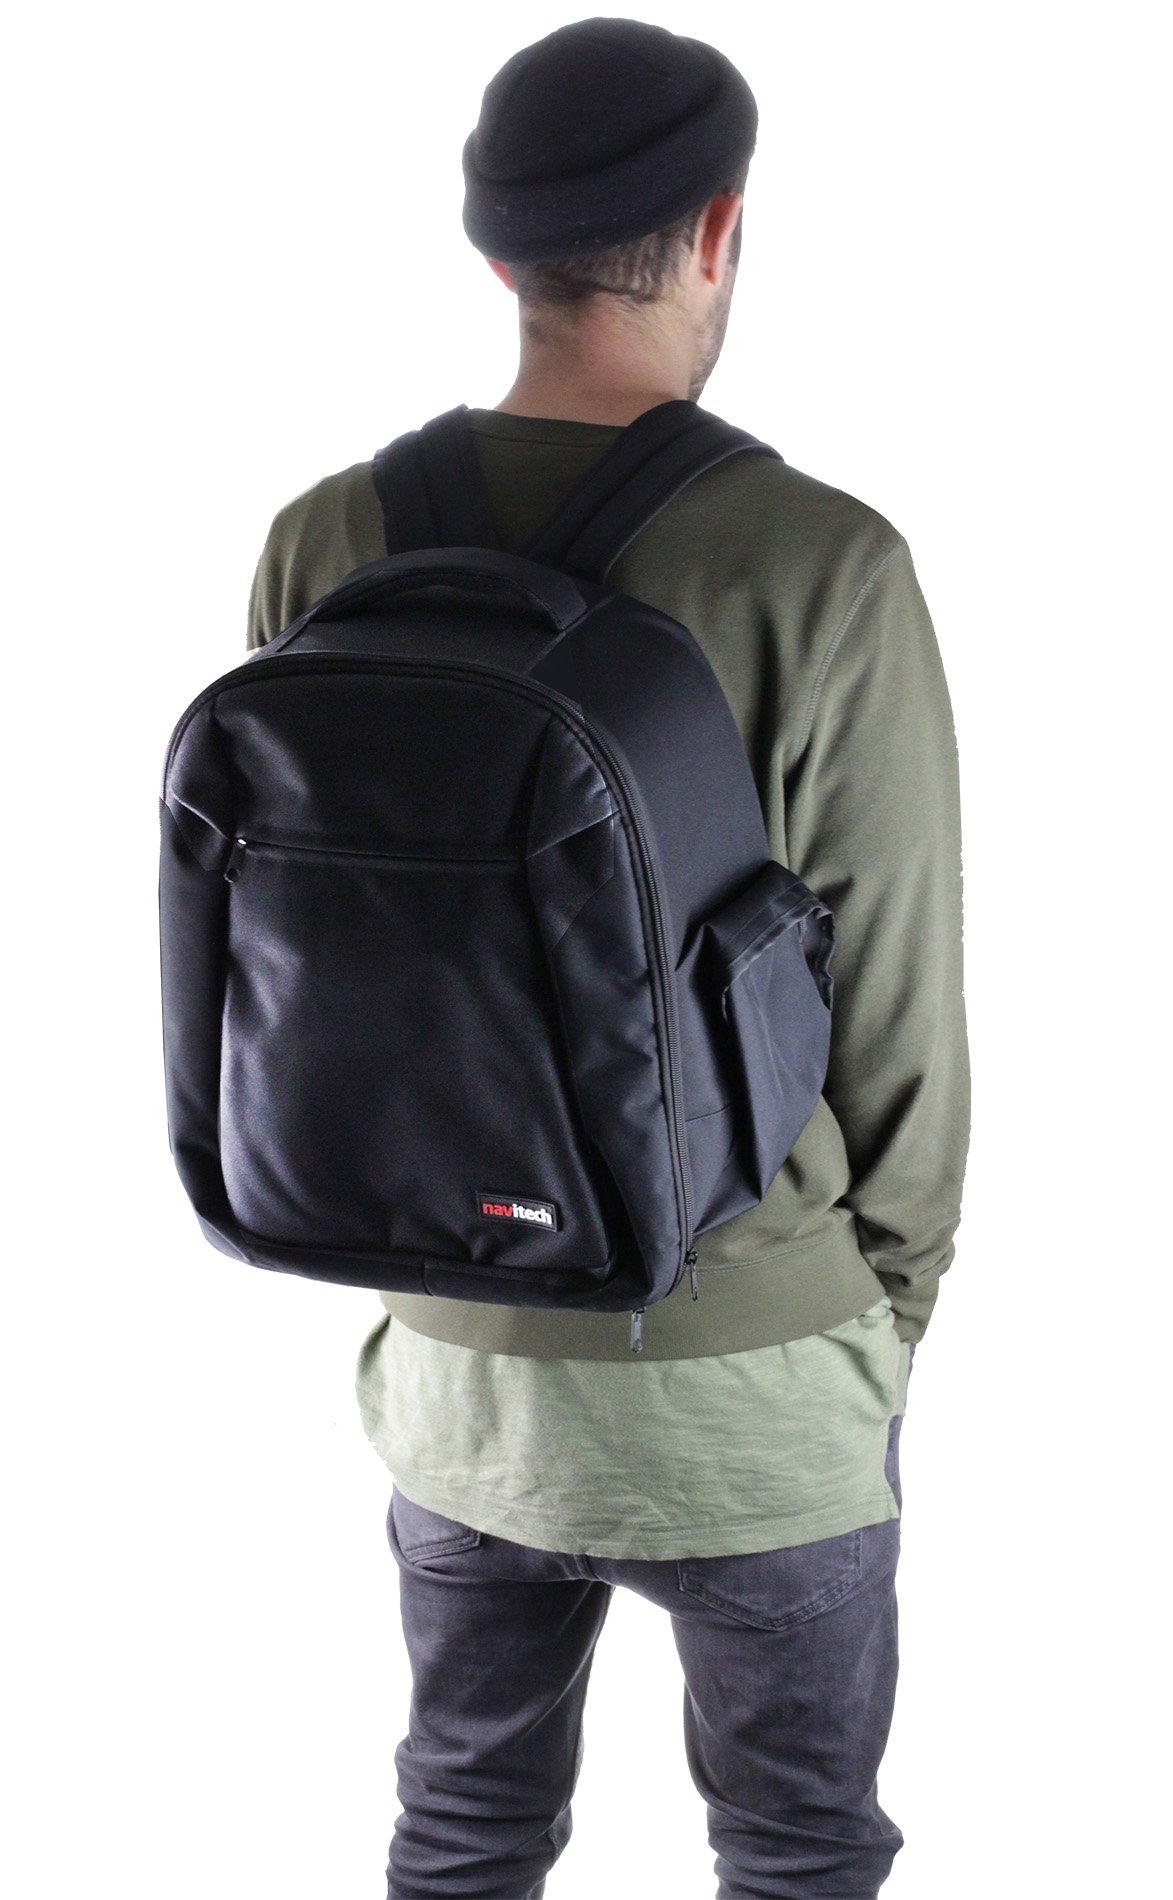 Navitech Rugged Black Backpack/Rucksack for The Oculus Rift + Oculus Touch Controller by Navitech (Image #5)